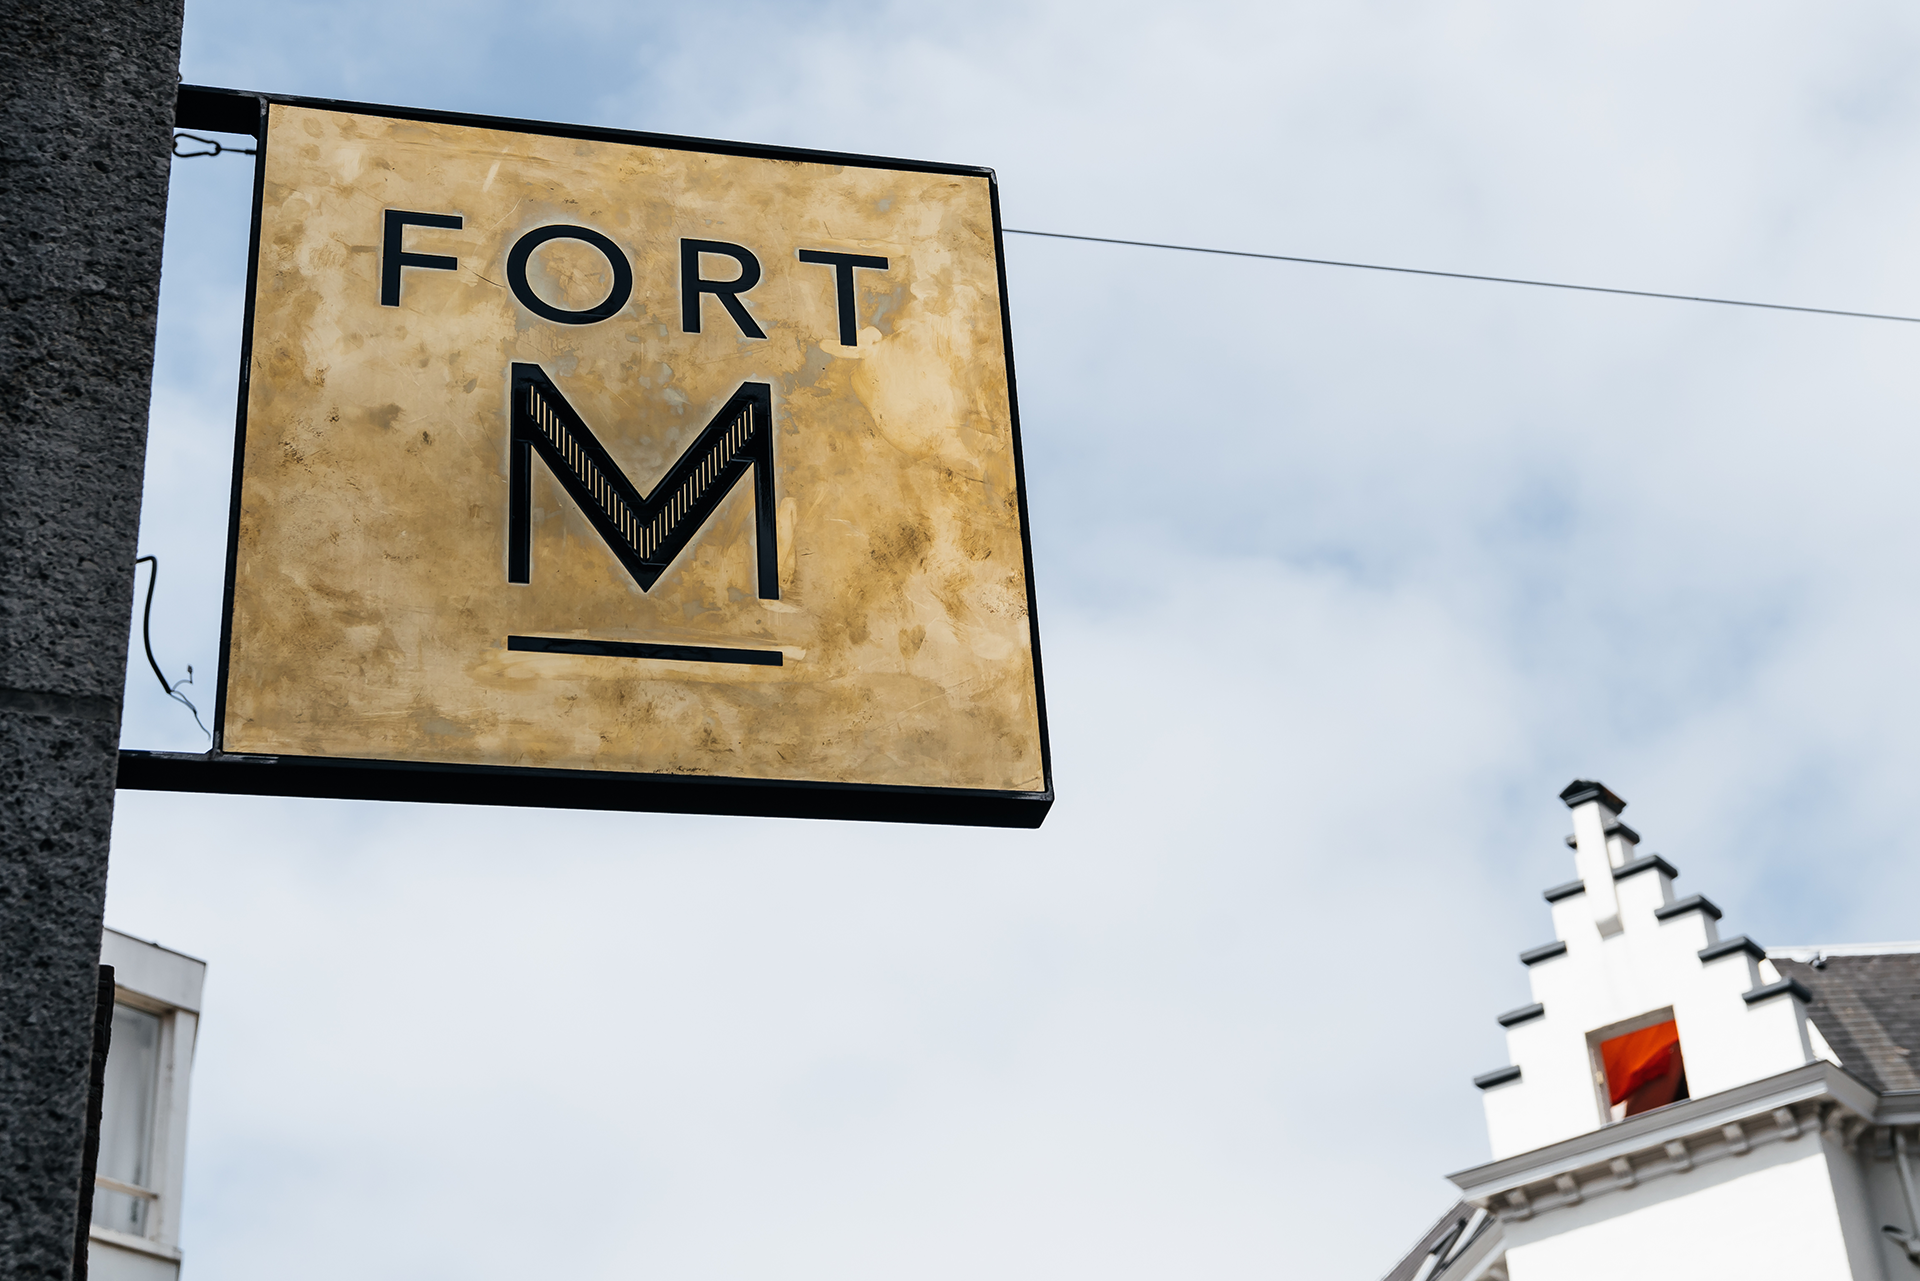 Fort M